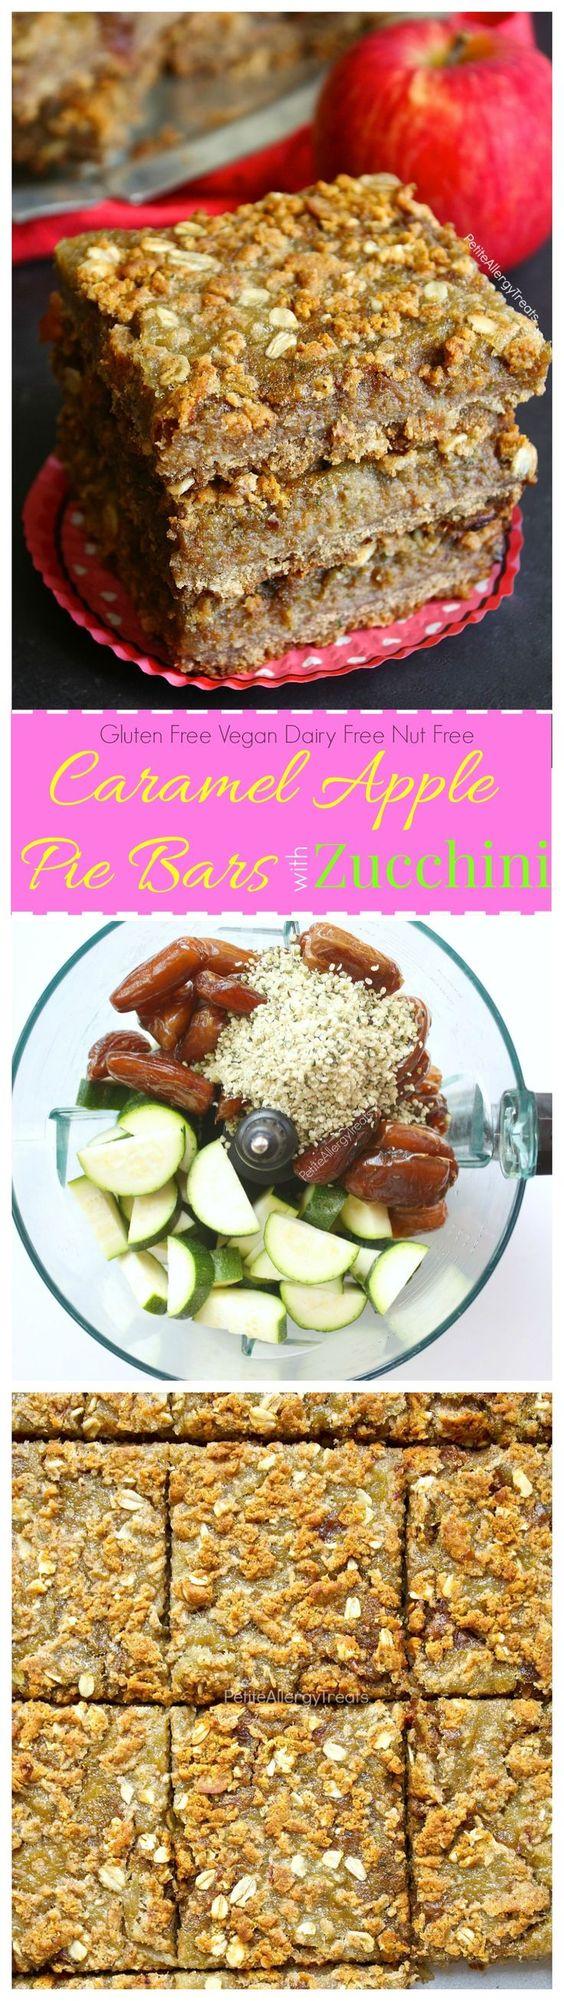 Gluten Free Caramel Apple Pie Bars Recipe (vegan dairy free)- Apple pie meets…: